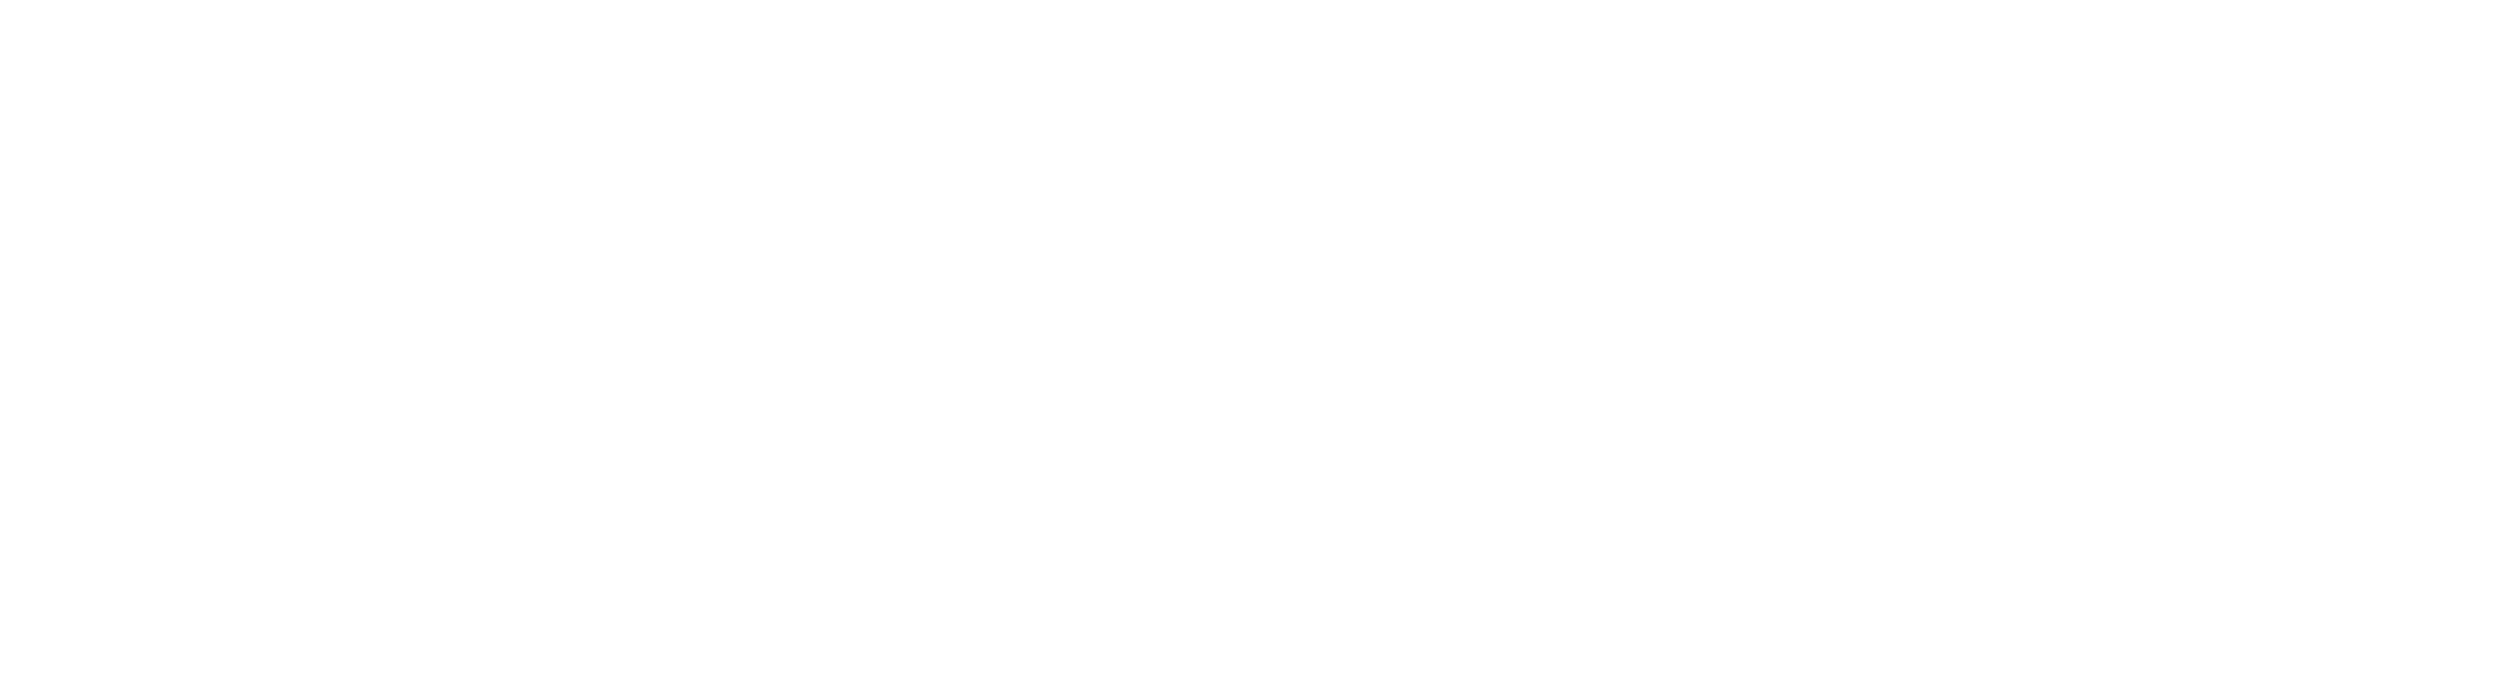 VIVA-6.png